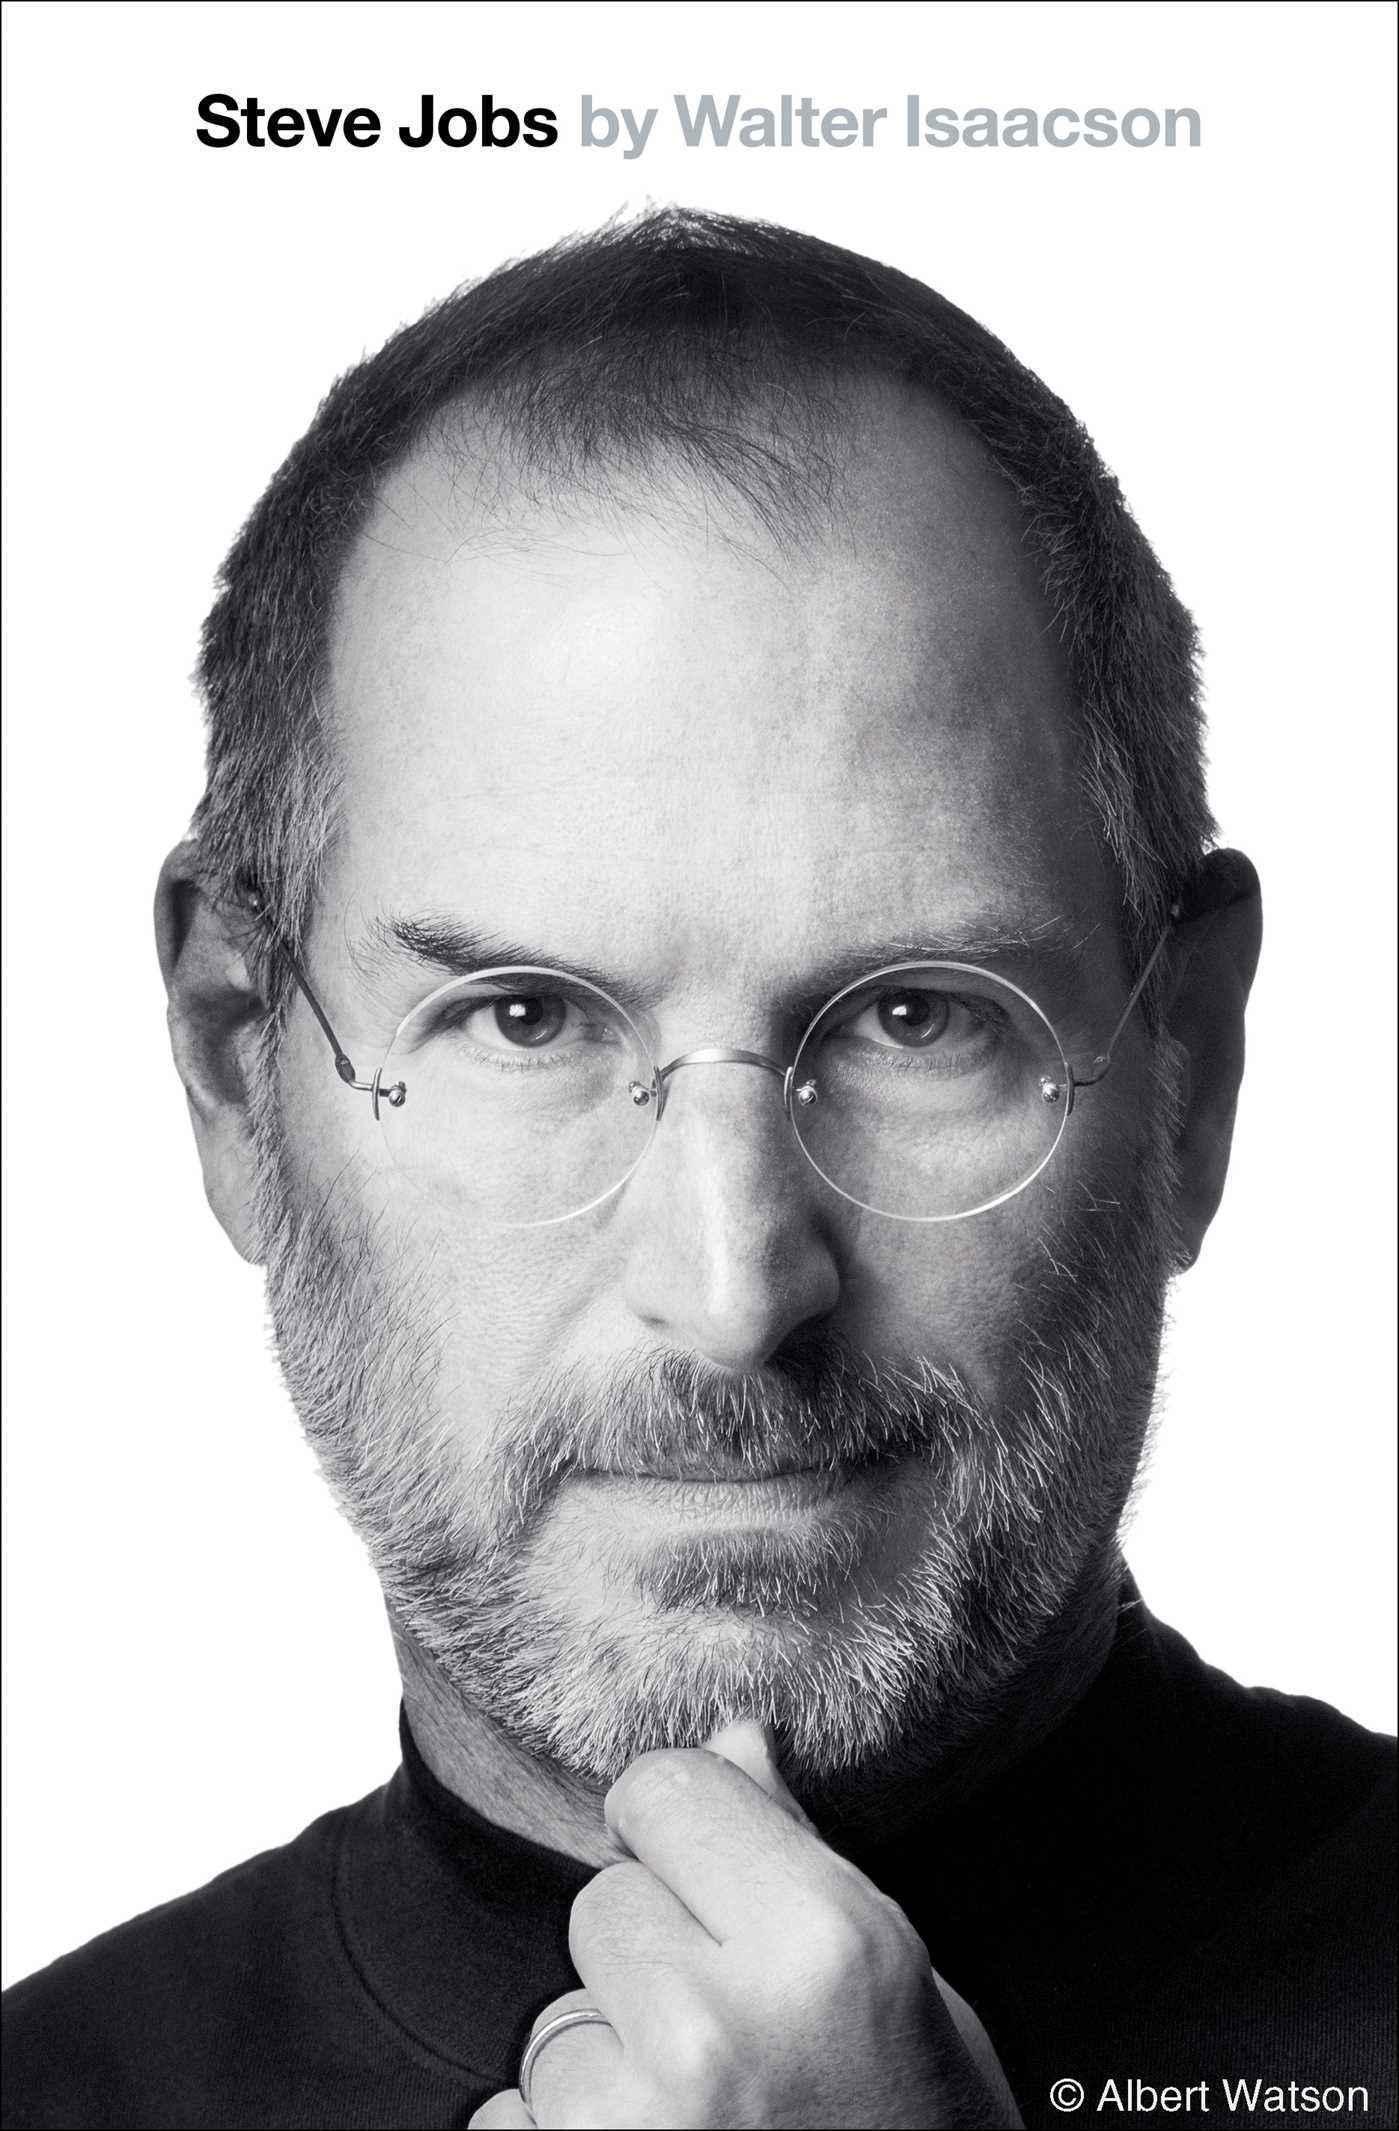 Book: Simon & Schuster Steve Jobs by Walter Issacson